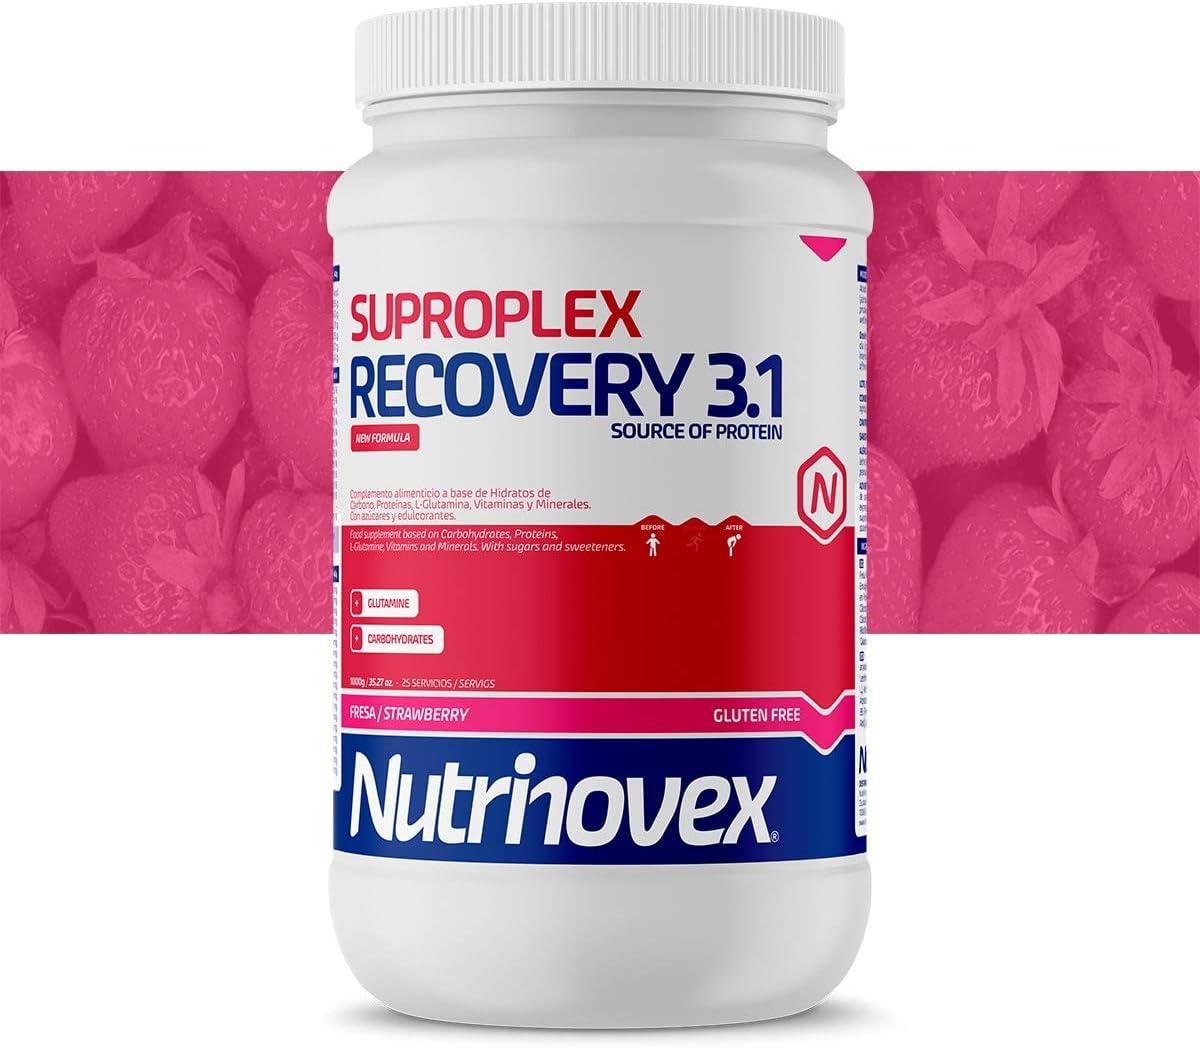 Nutrinovex Suproplex Recovery 3.1. con Glutamina, Minerales y Vitaminas (Fresa, 1000 g)